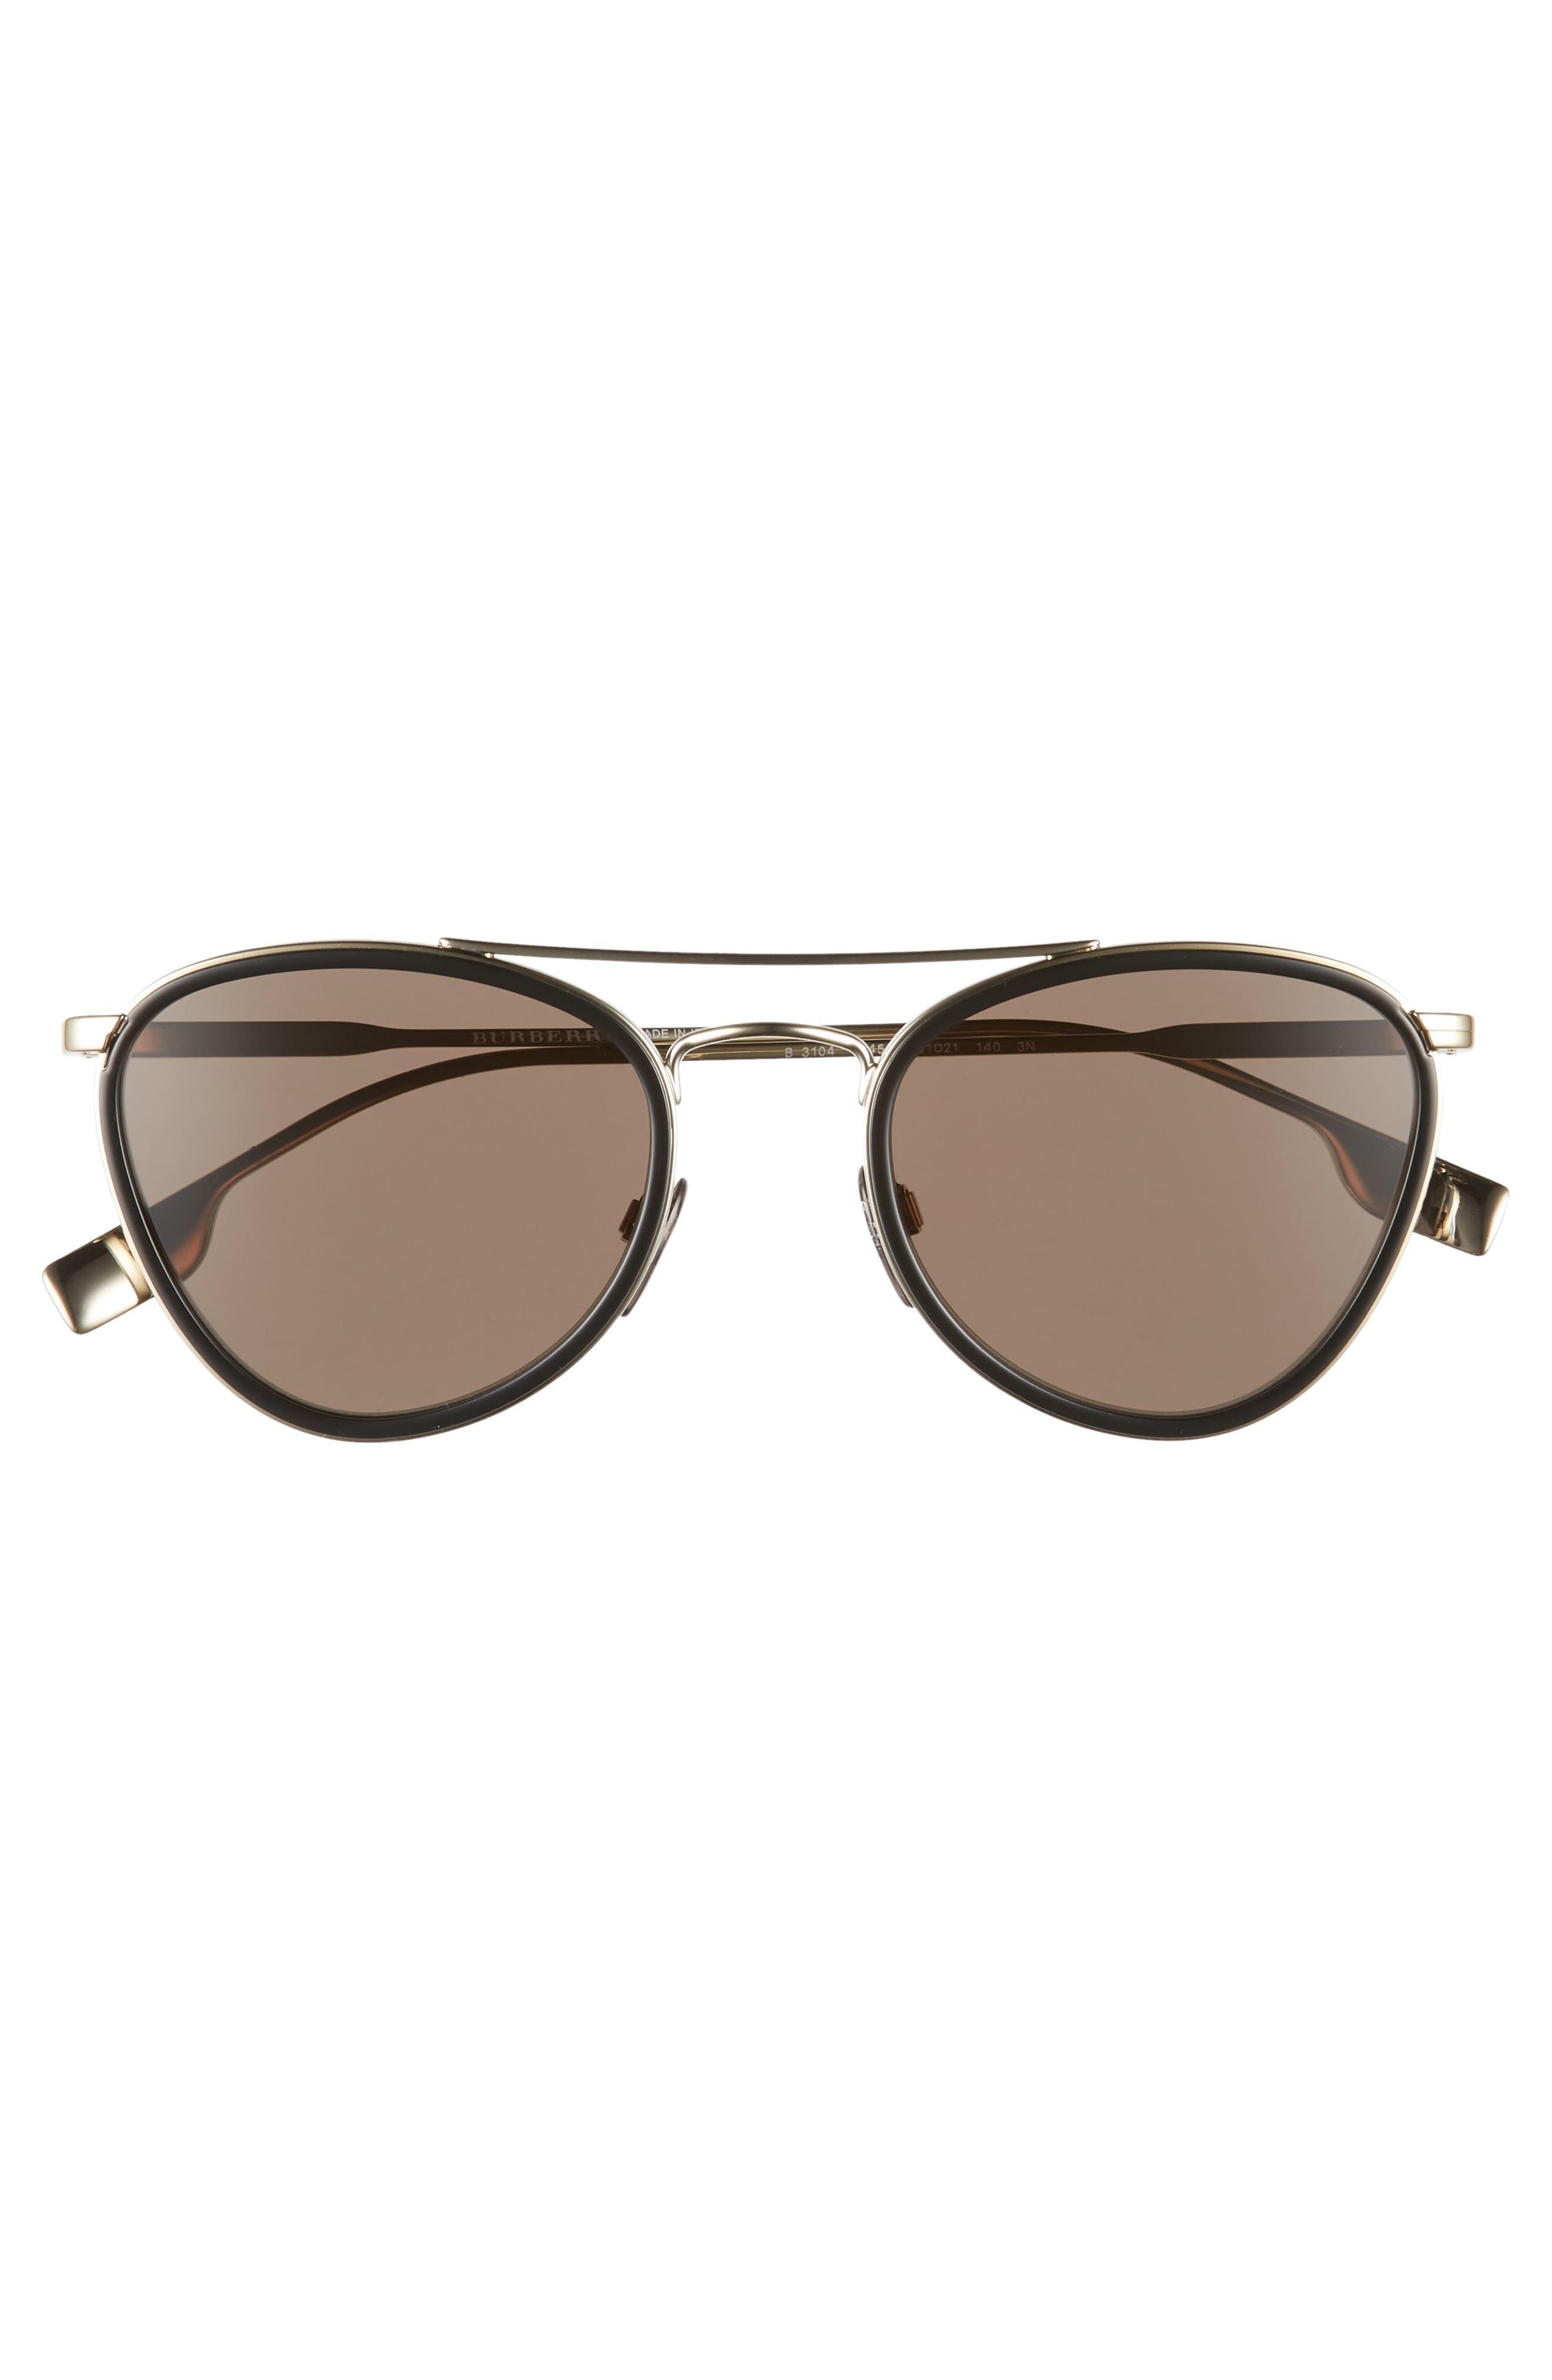 51mm Aviator Sunglasses,                             Alternate thumbnail 3, color,                             BLACK/ GOLD SOLID